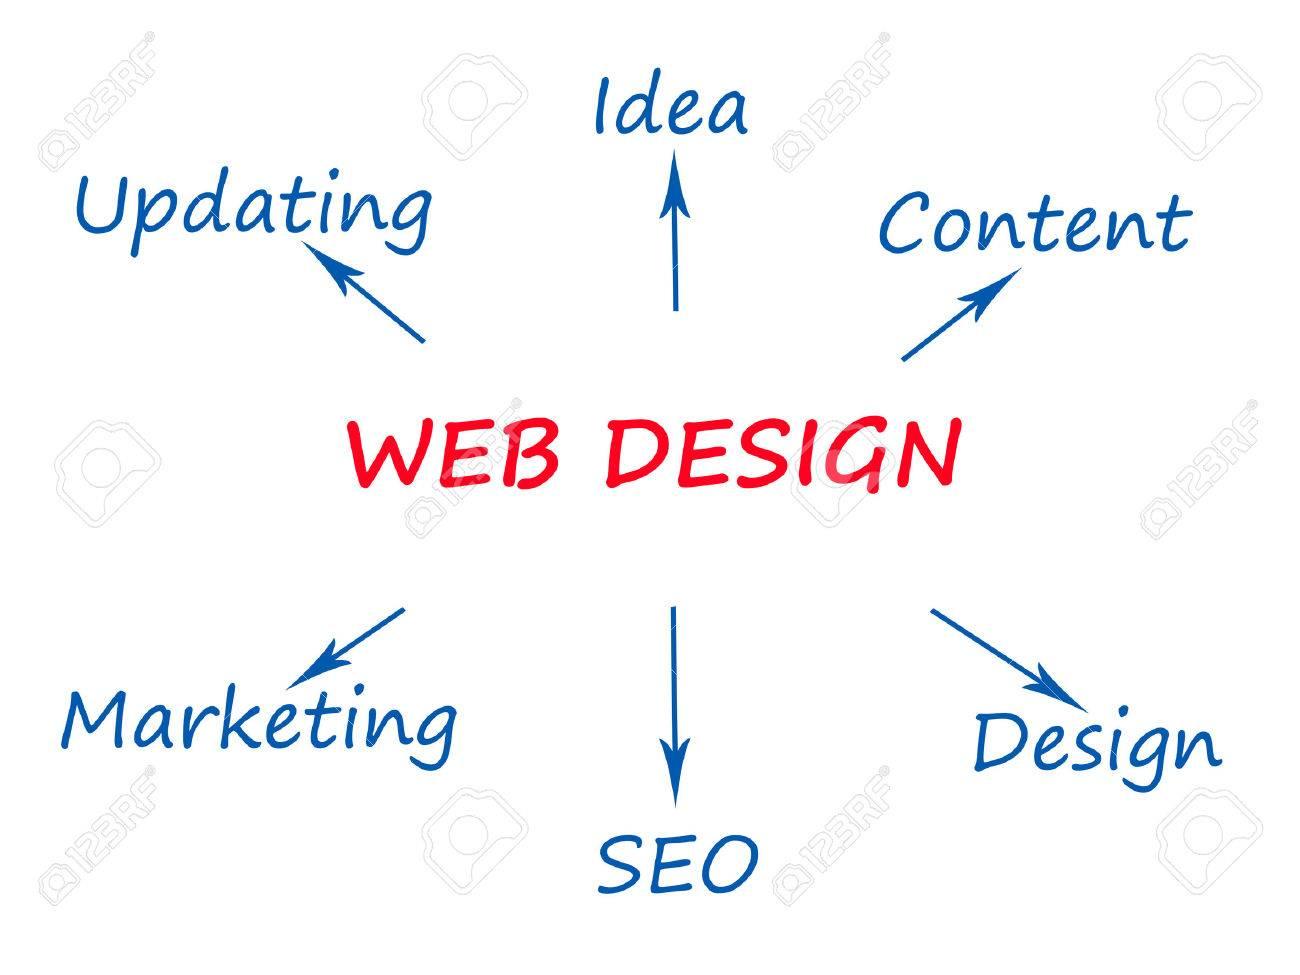 Web Design Stock Photo - 27471364